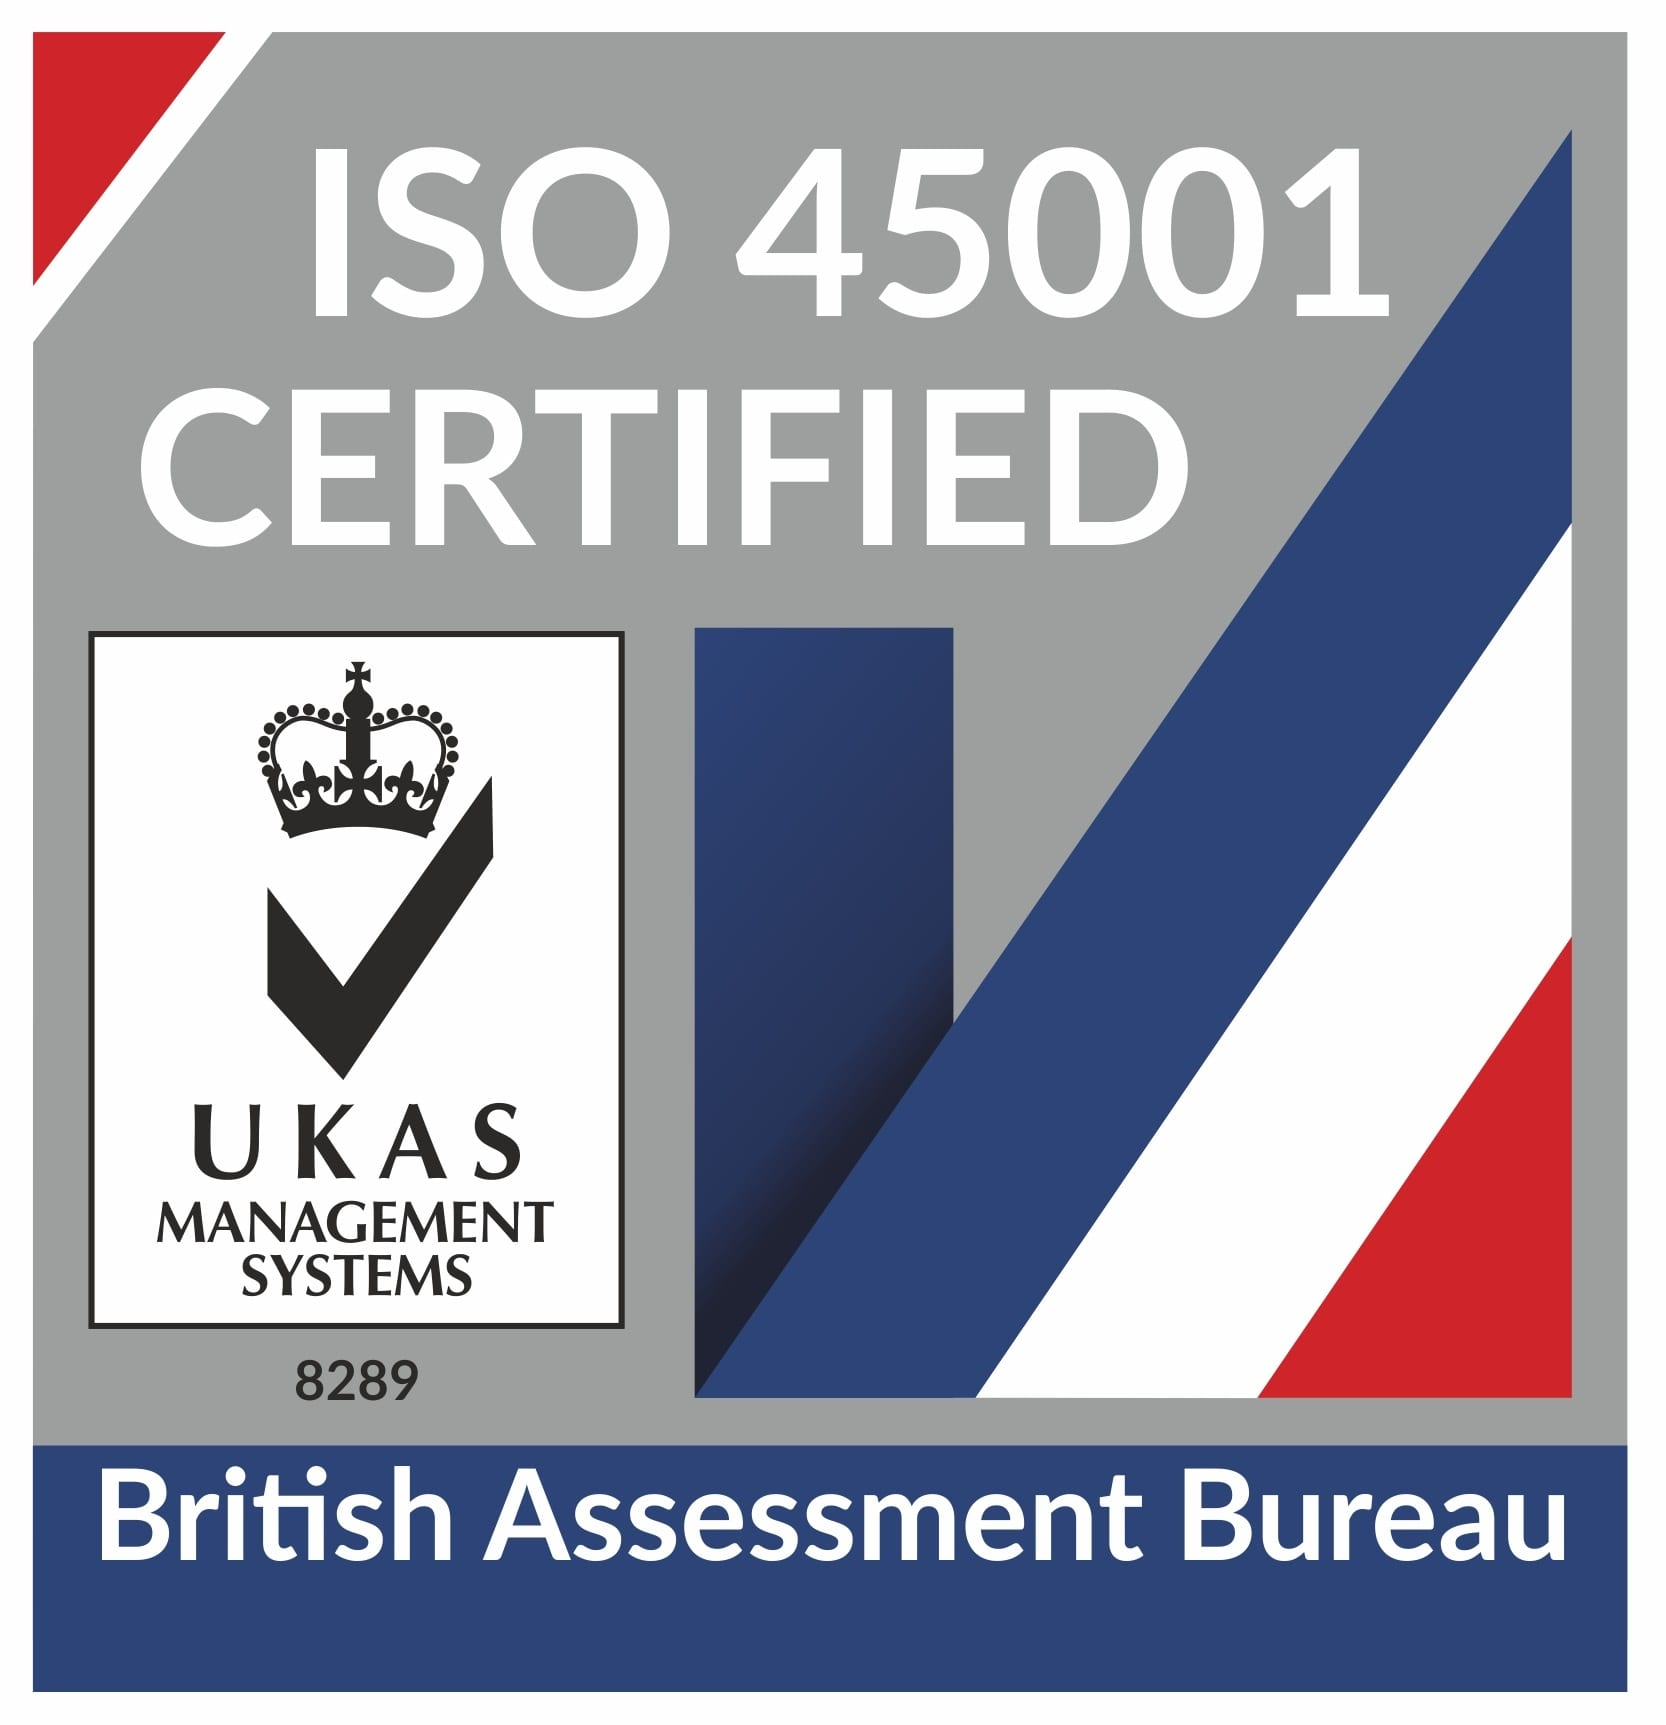 ISO-45001-UKAS